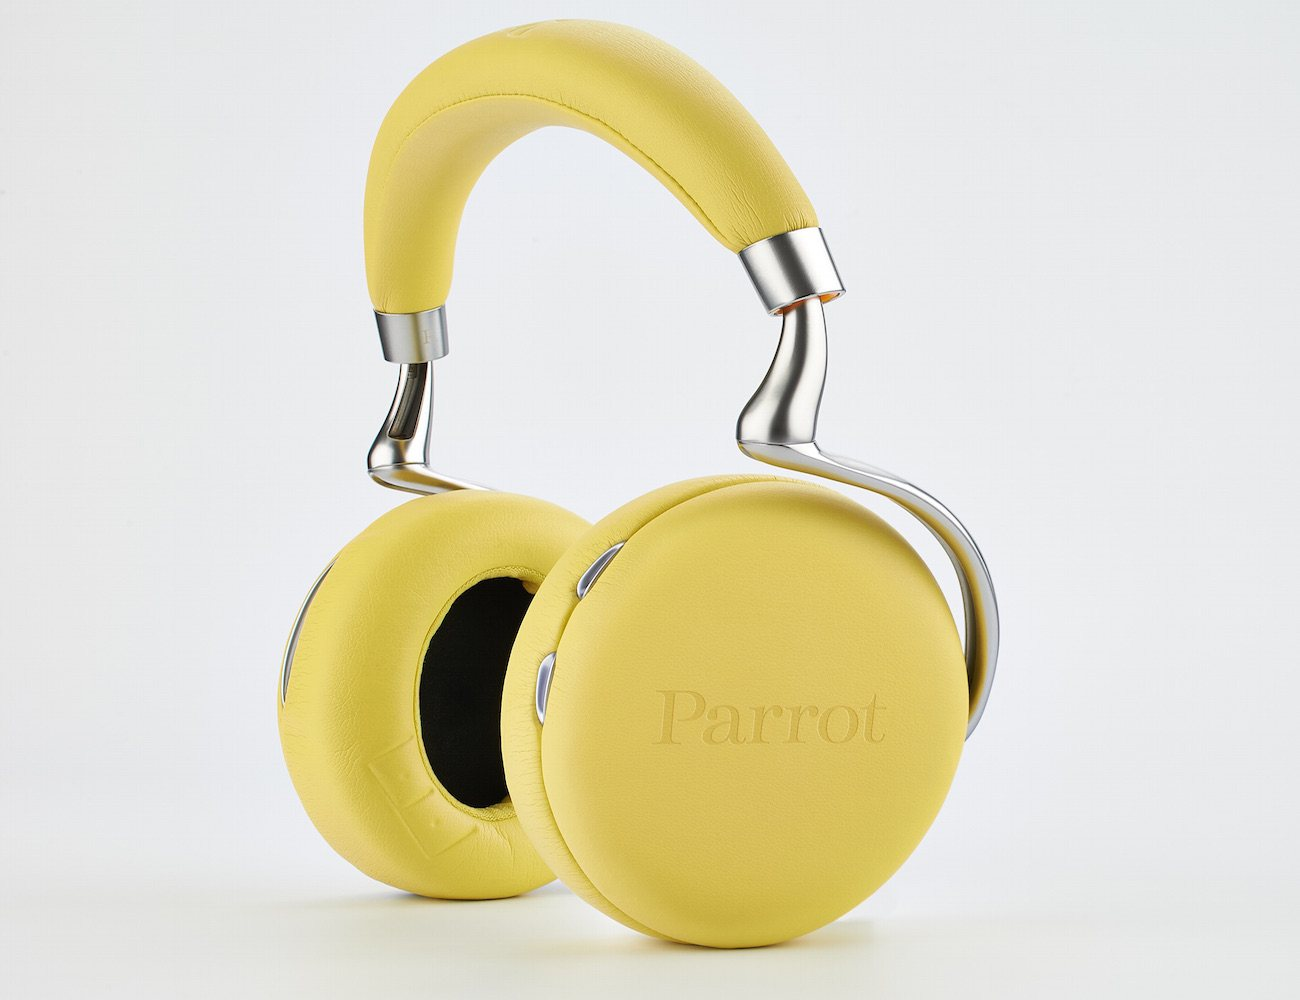 Parrot Zik 2.0 – The World's Most Advanced Headphones